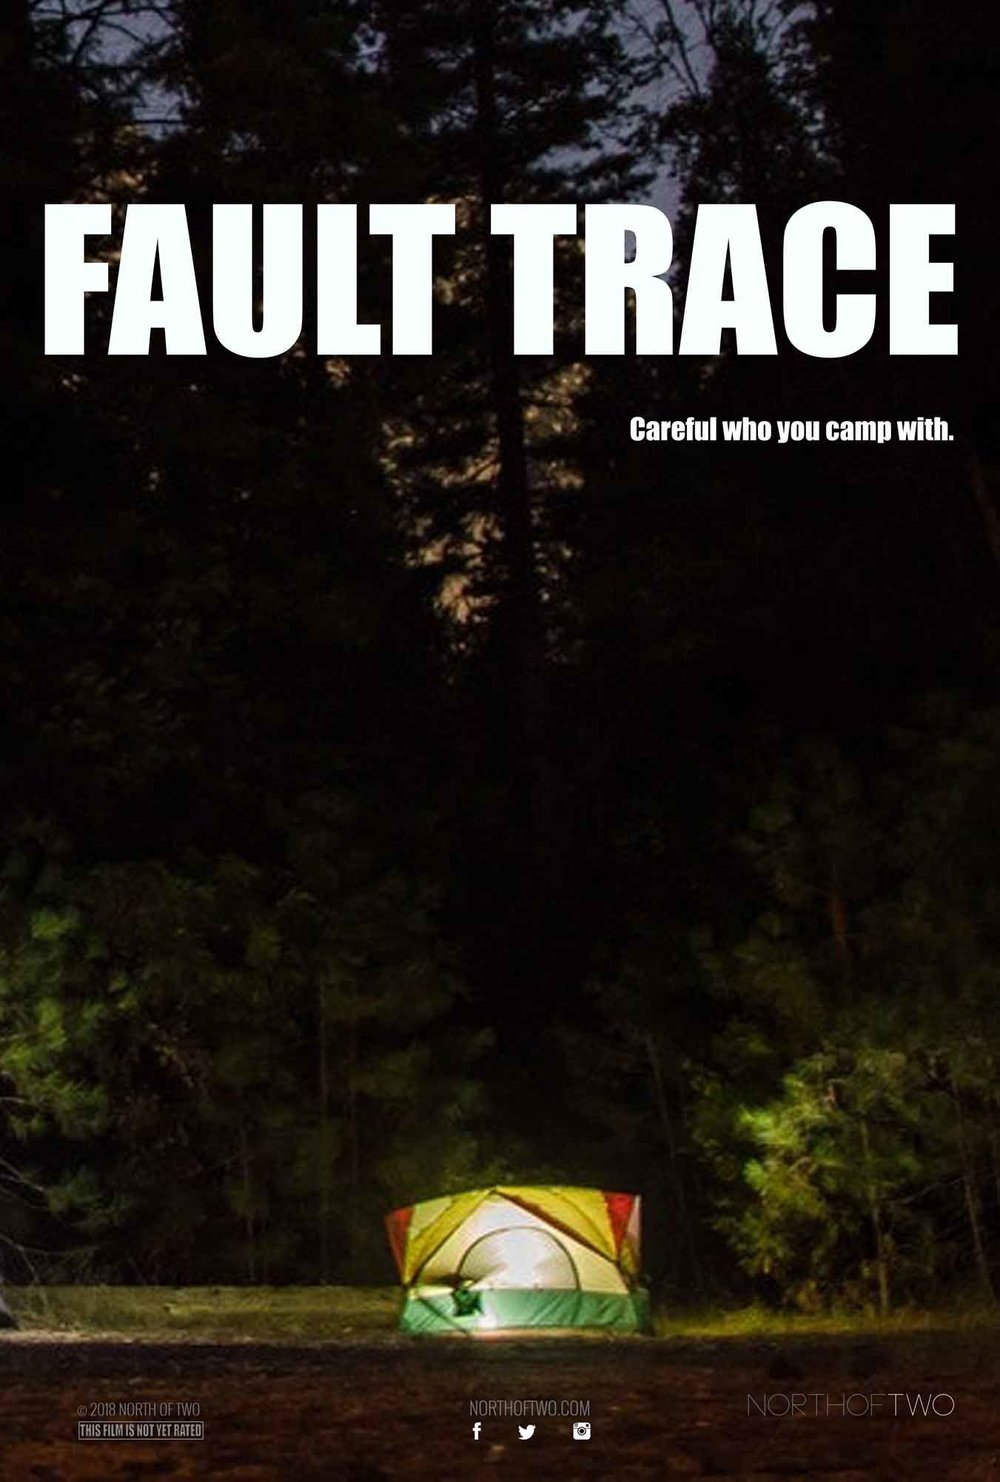 FAULT-TRACE-TEMP-option2.jpg